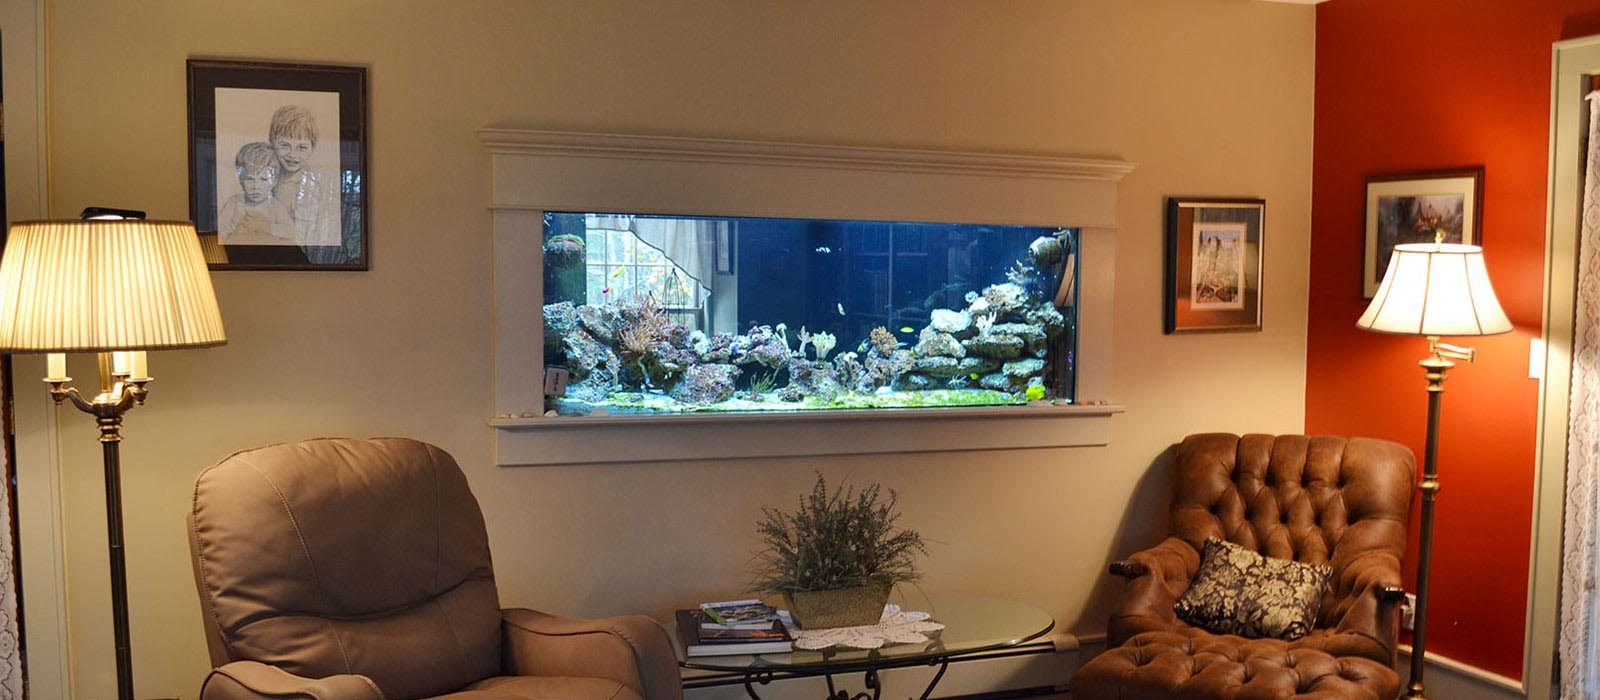 Aquarium wall mounted fish tank hf02 aquarium design ideas for Fish tank in wall